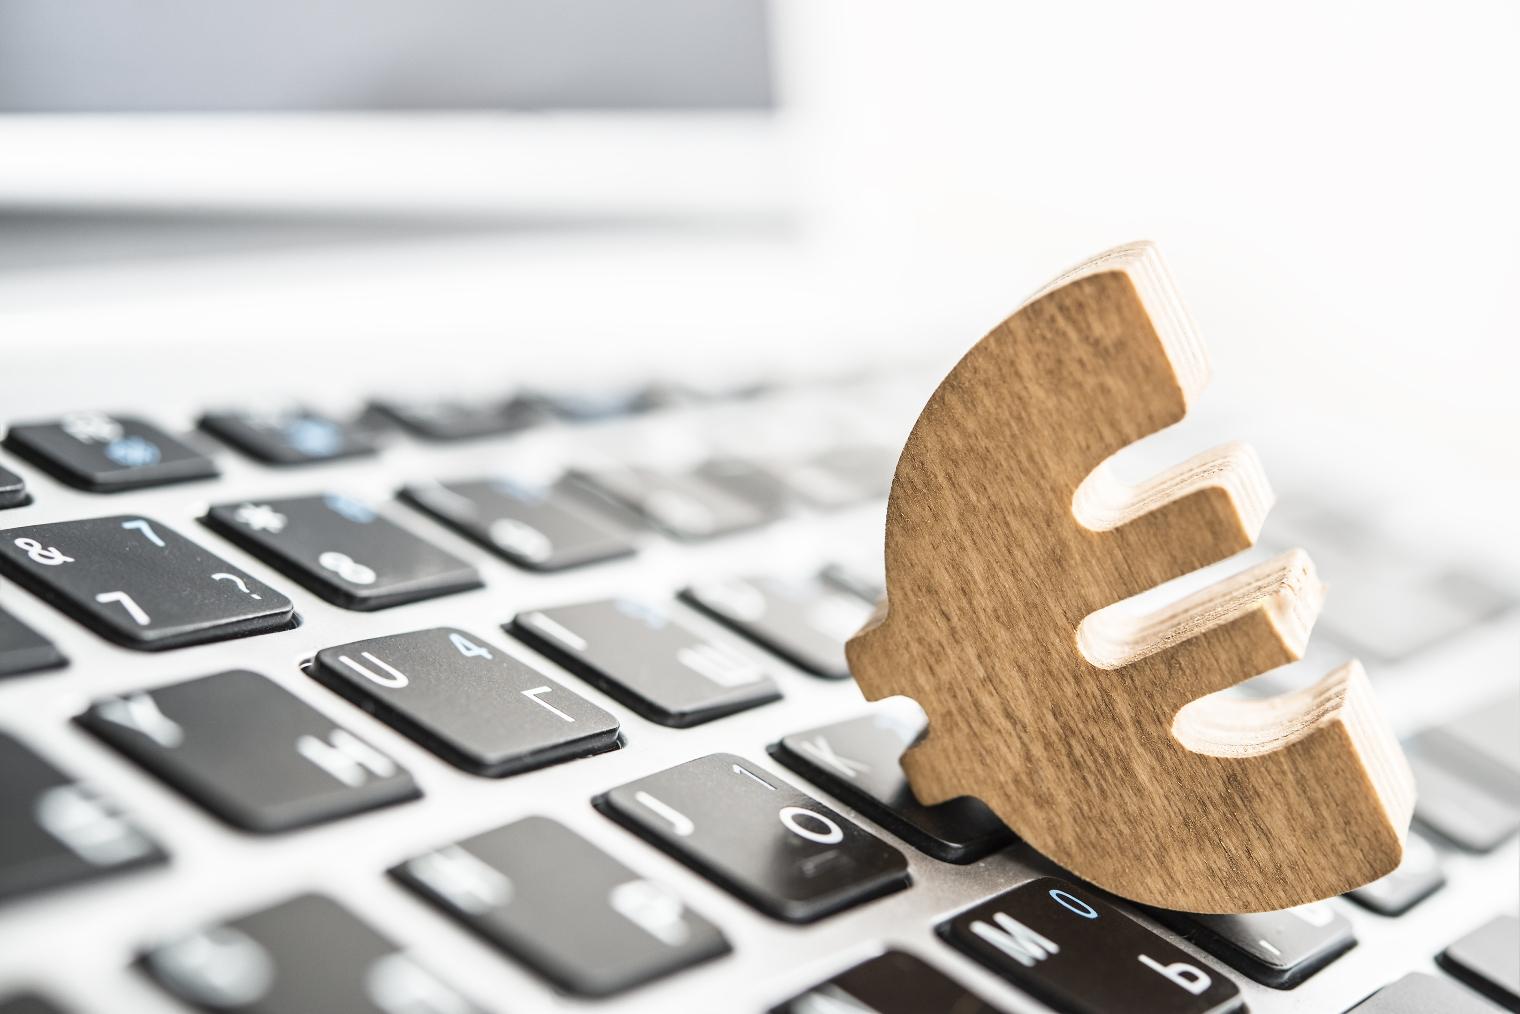 wooden euro sign lie on keyboard of laptop in perspective. financial idea, concept.; Shutterstock ID 438950455; Purchase Order: Digital, Bauschalter, Schlagfertigkeit ; Job: ; Client/Licensee: ; Other: